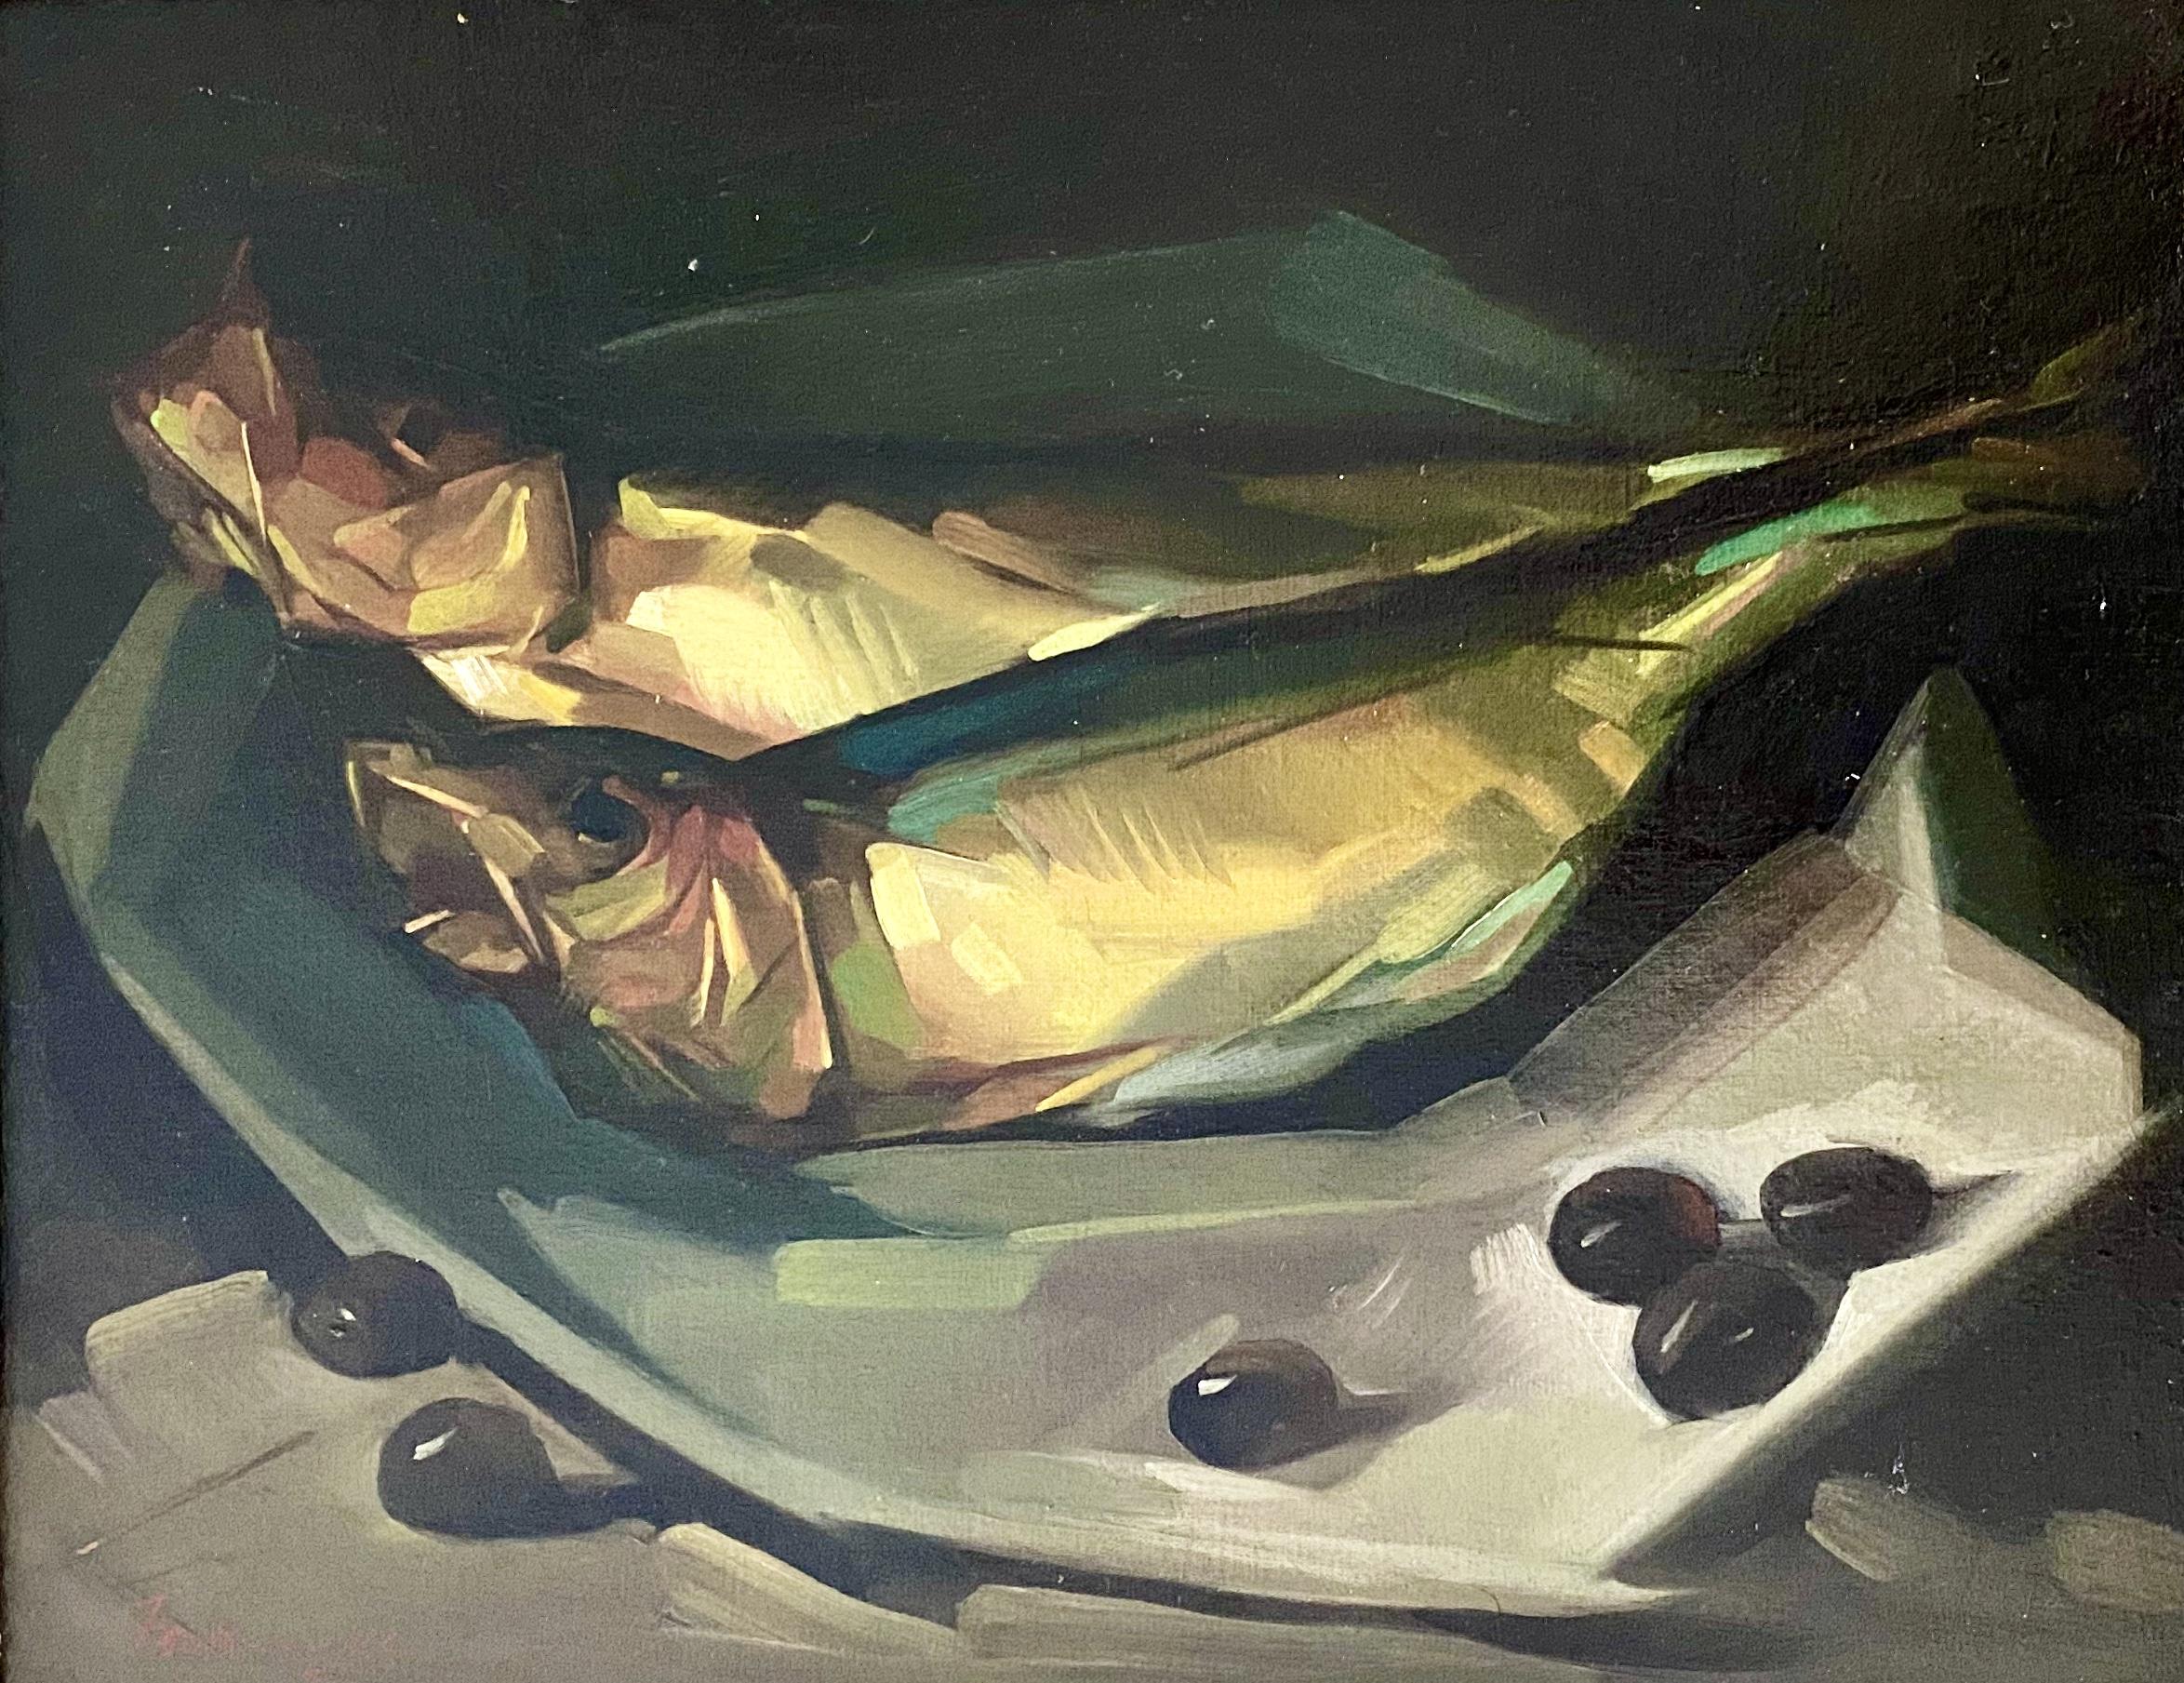 Ioannis Tzovanakis (Greek), Still Life, oil on panel, 27 x 34 cm